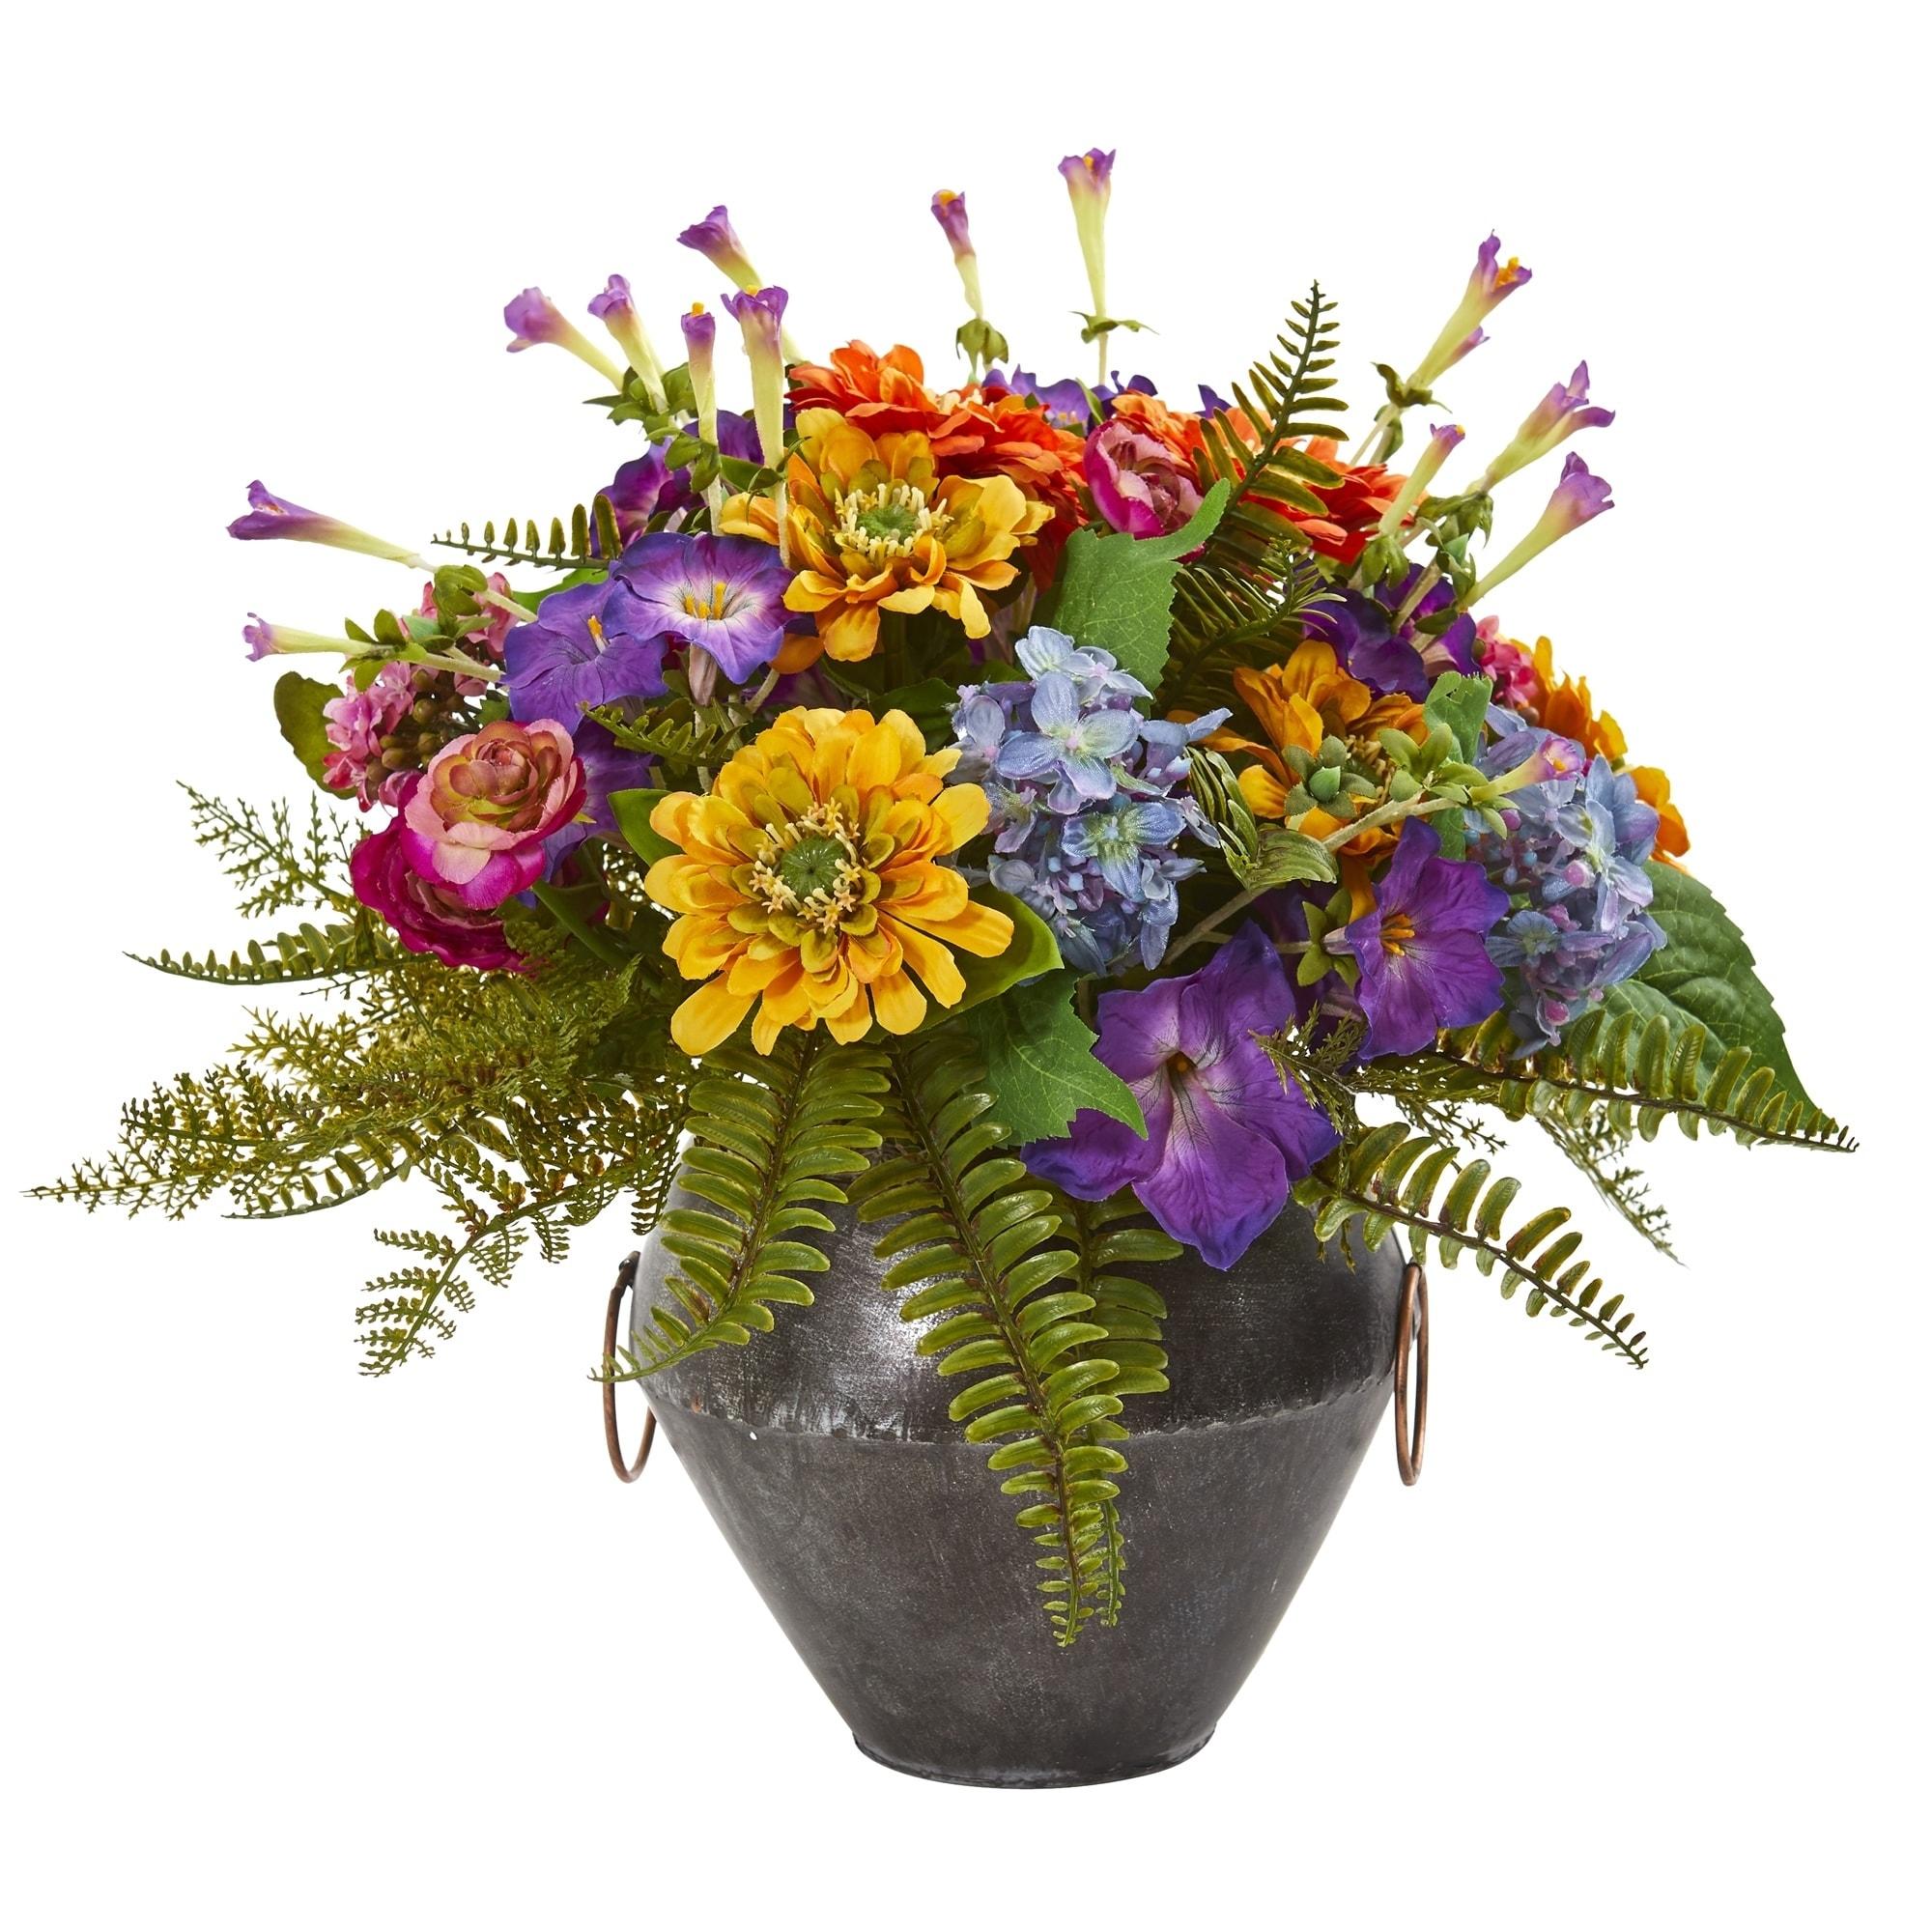 Mixed Flowers Artificial Arrangement in Metal Bowl